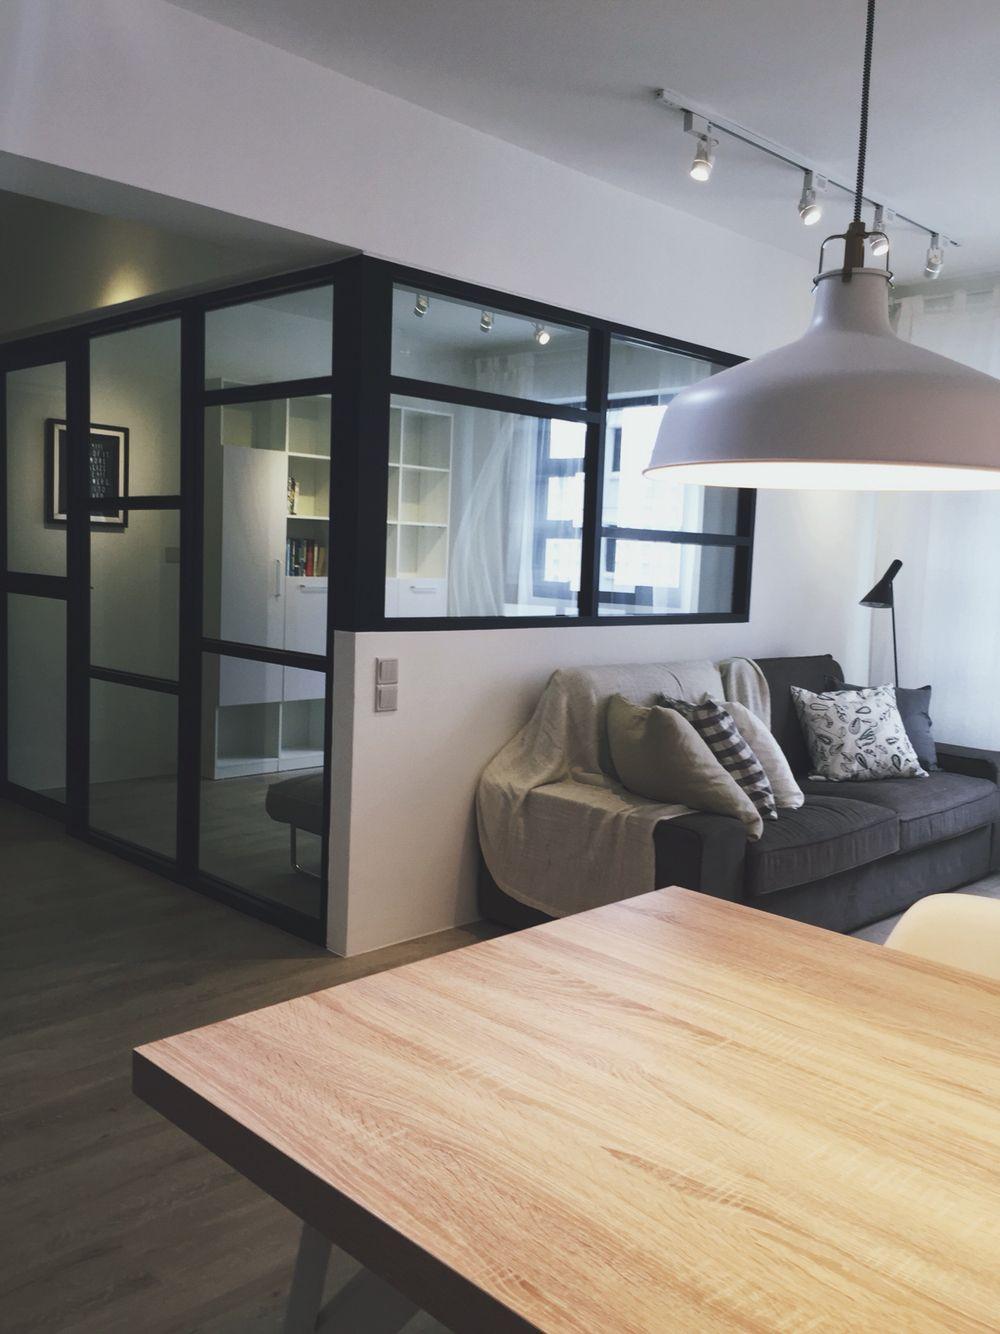 Hdb Living Room Decorating Ideas: Living Room Entertainment, Home Decor